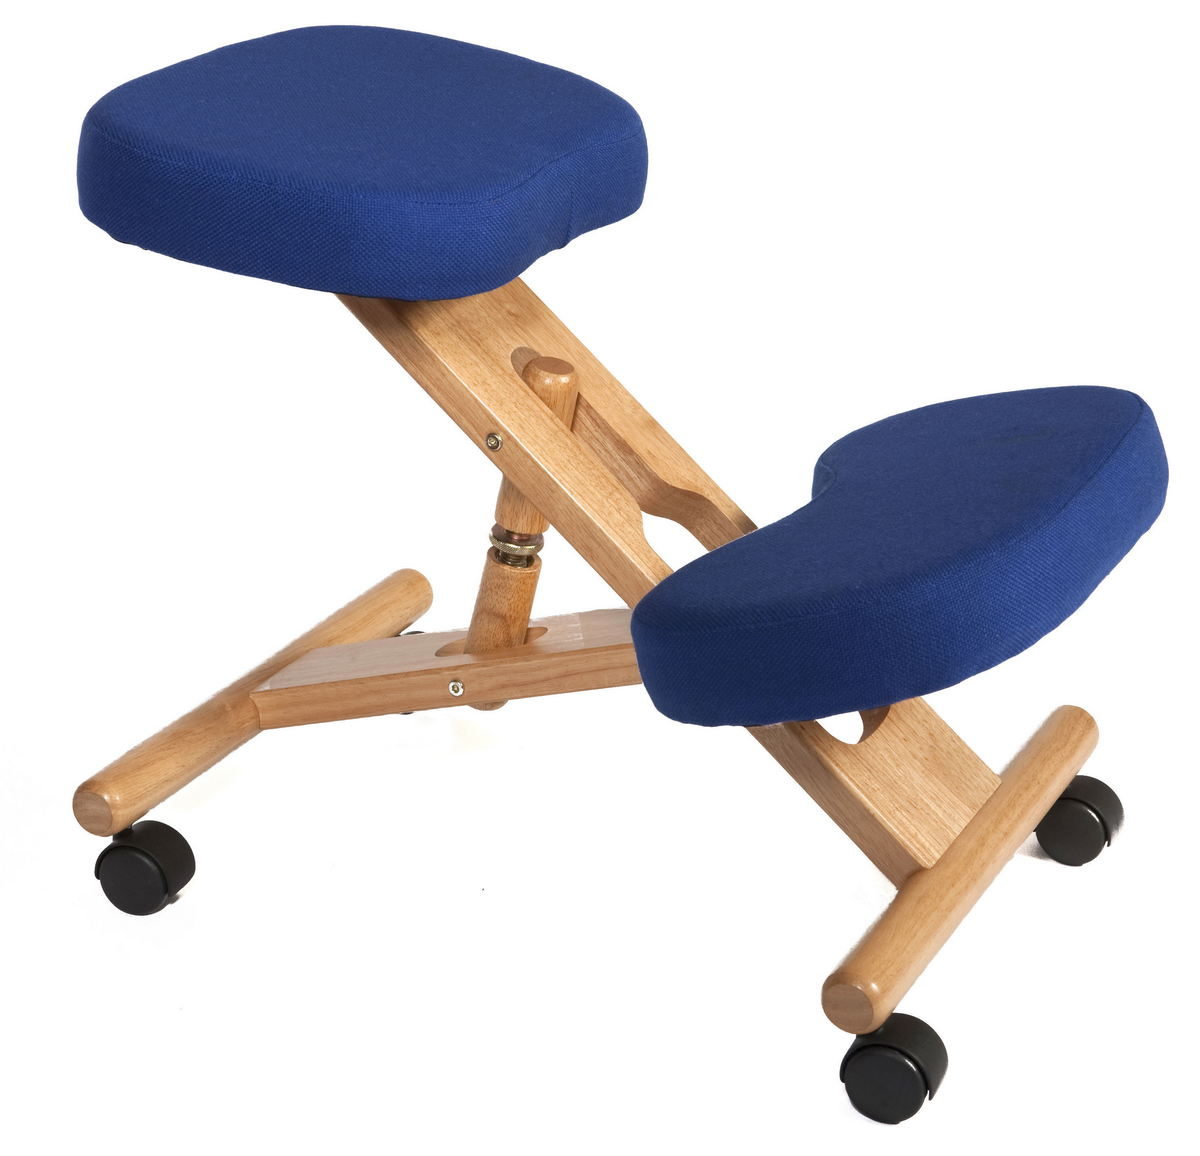 Kneeling Chairs Uk No 1 Kneeling Chair For Sale Online